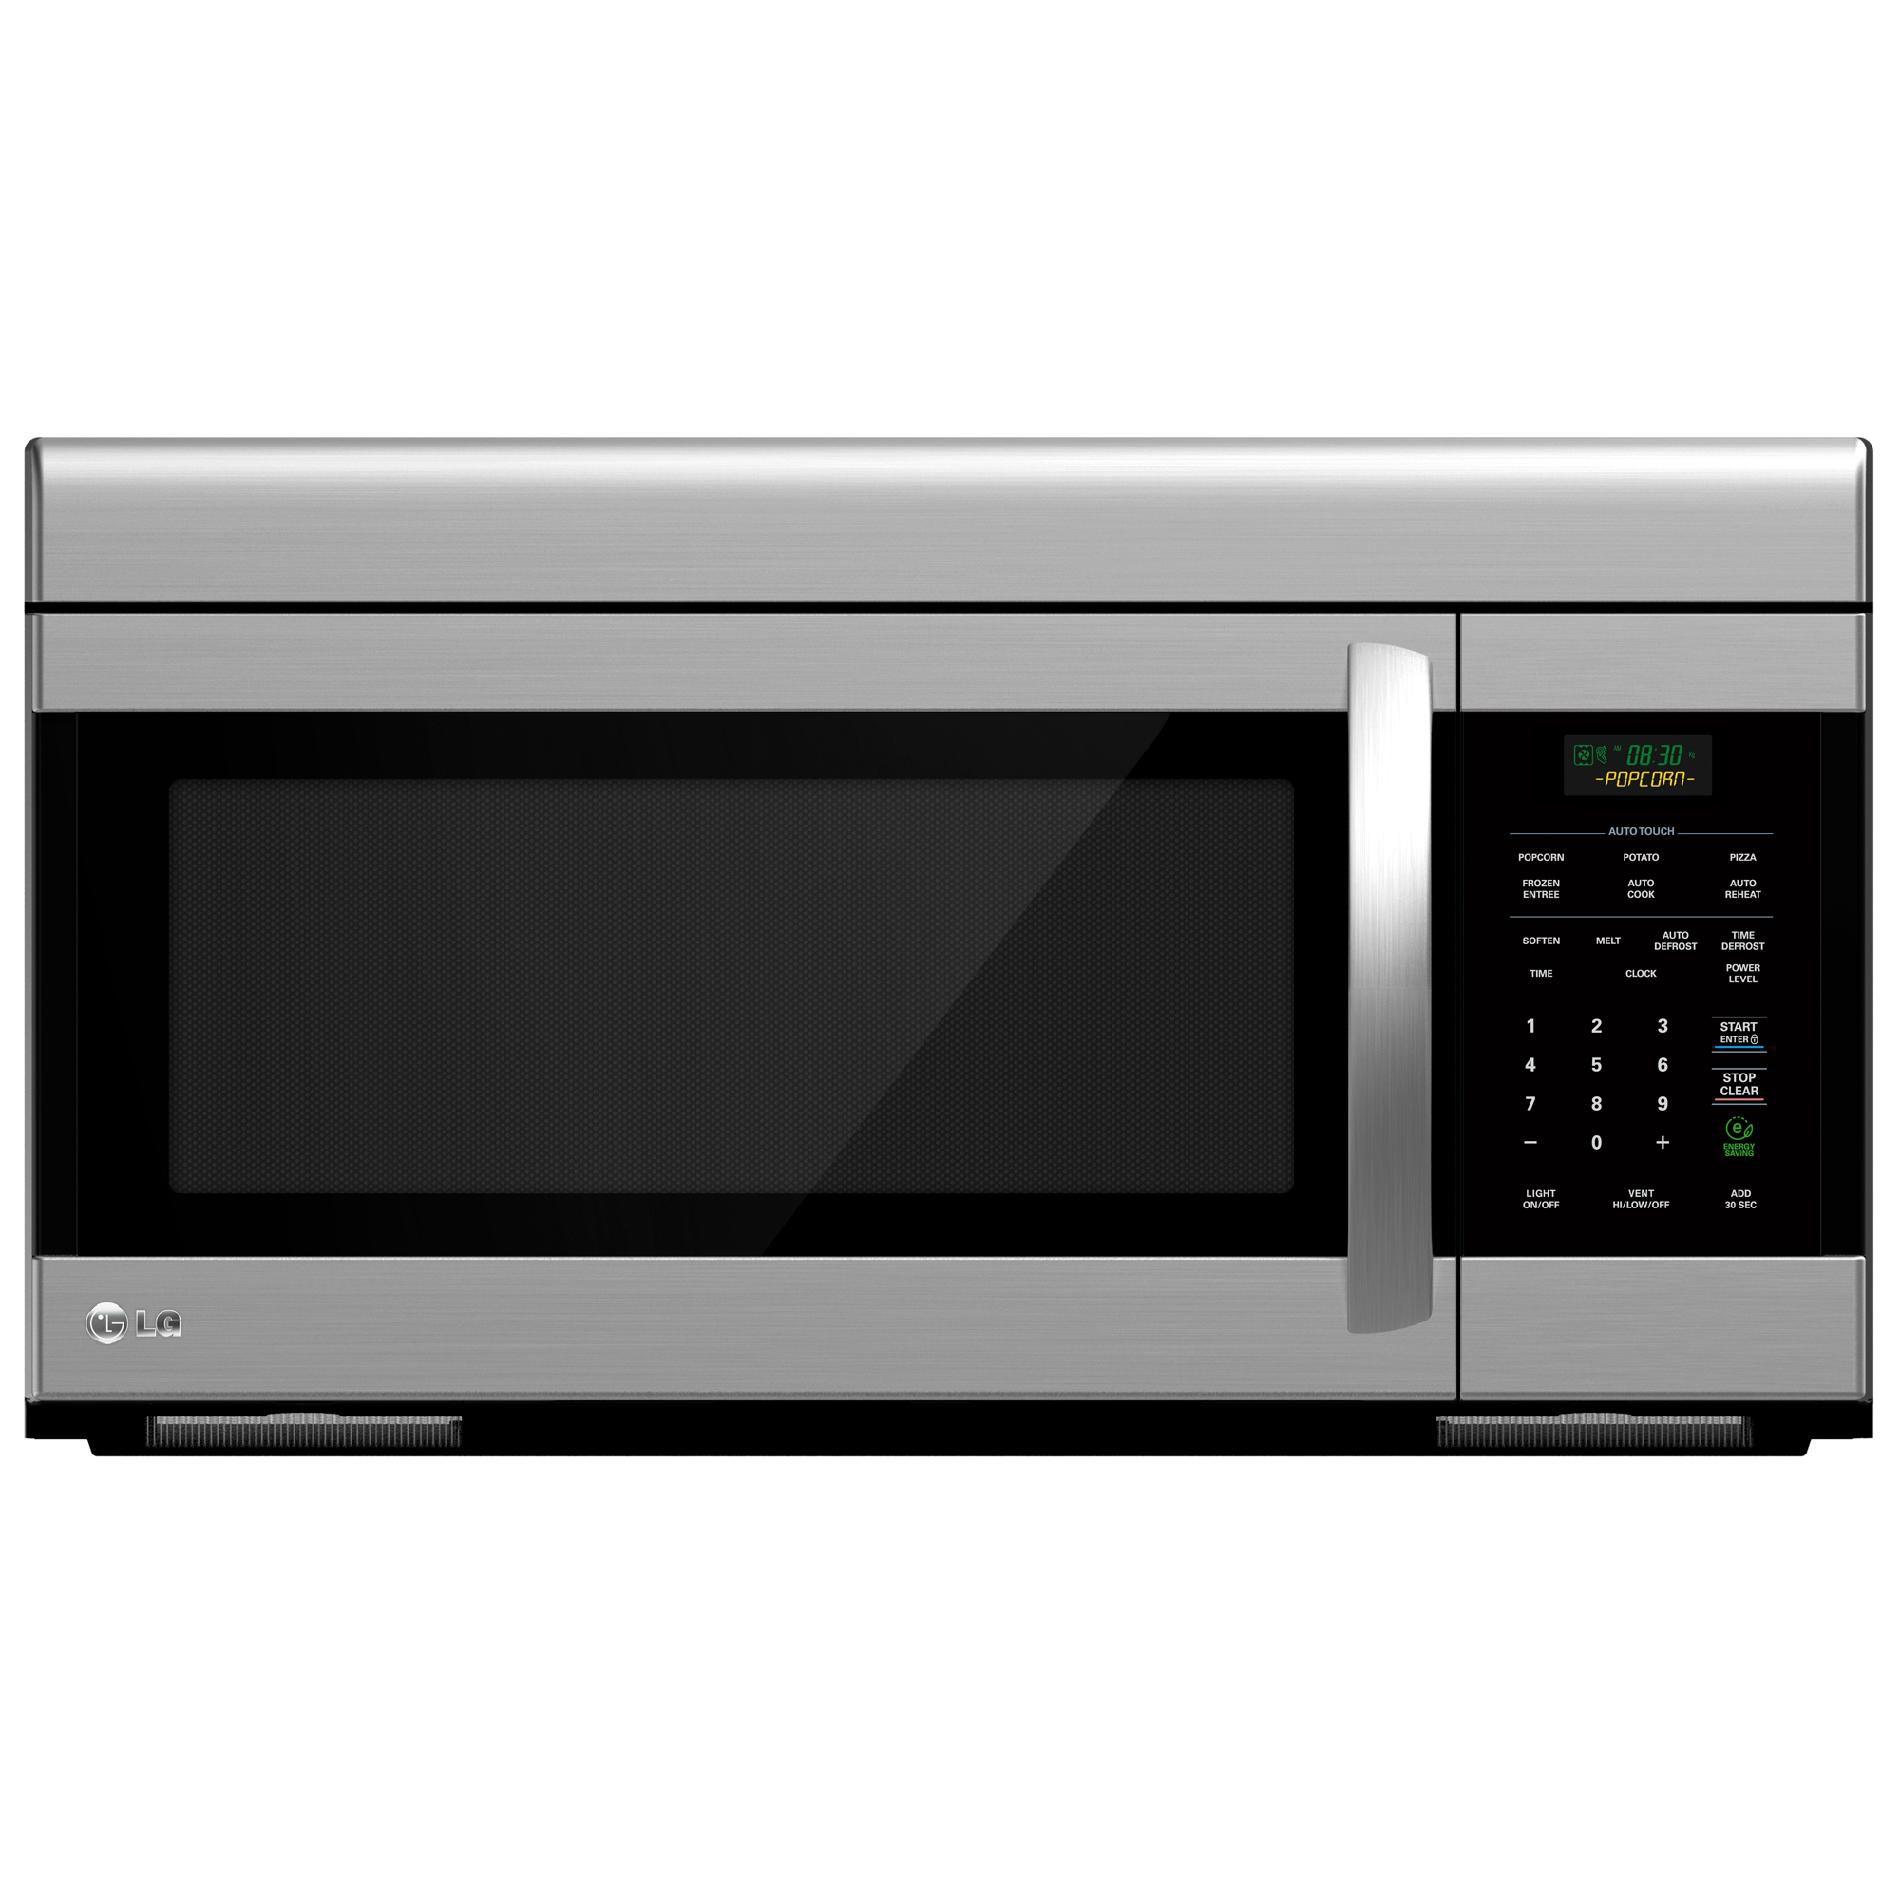 lg lmv1683st 1 6 cu ft stainless steel over the range microwave